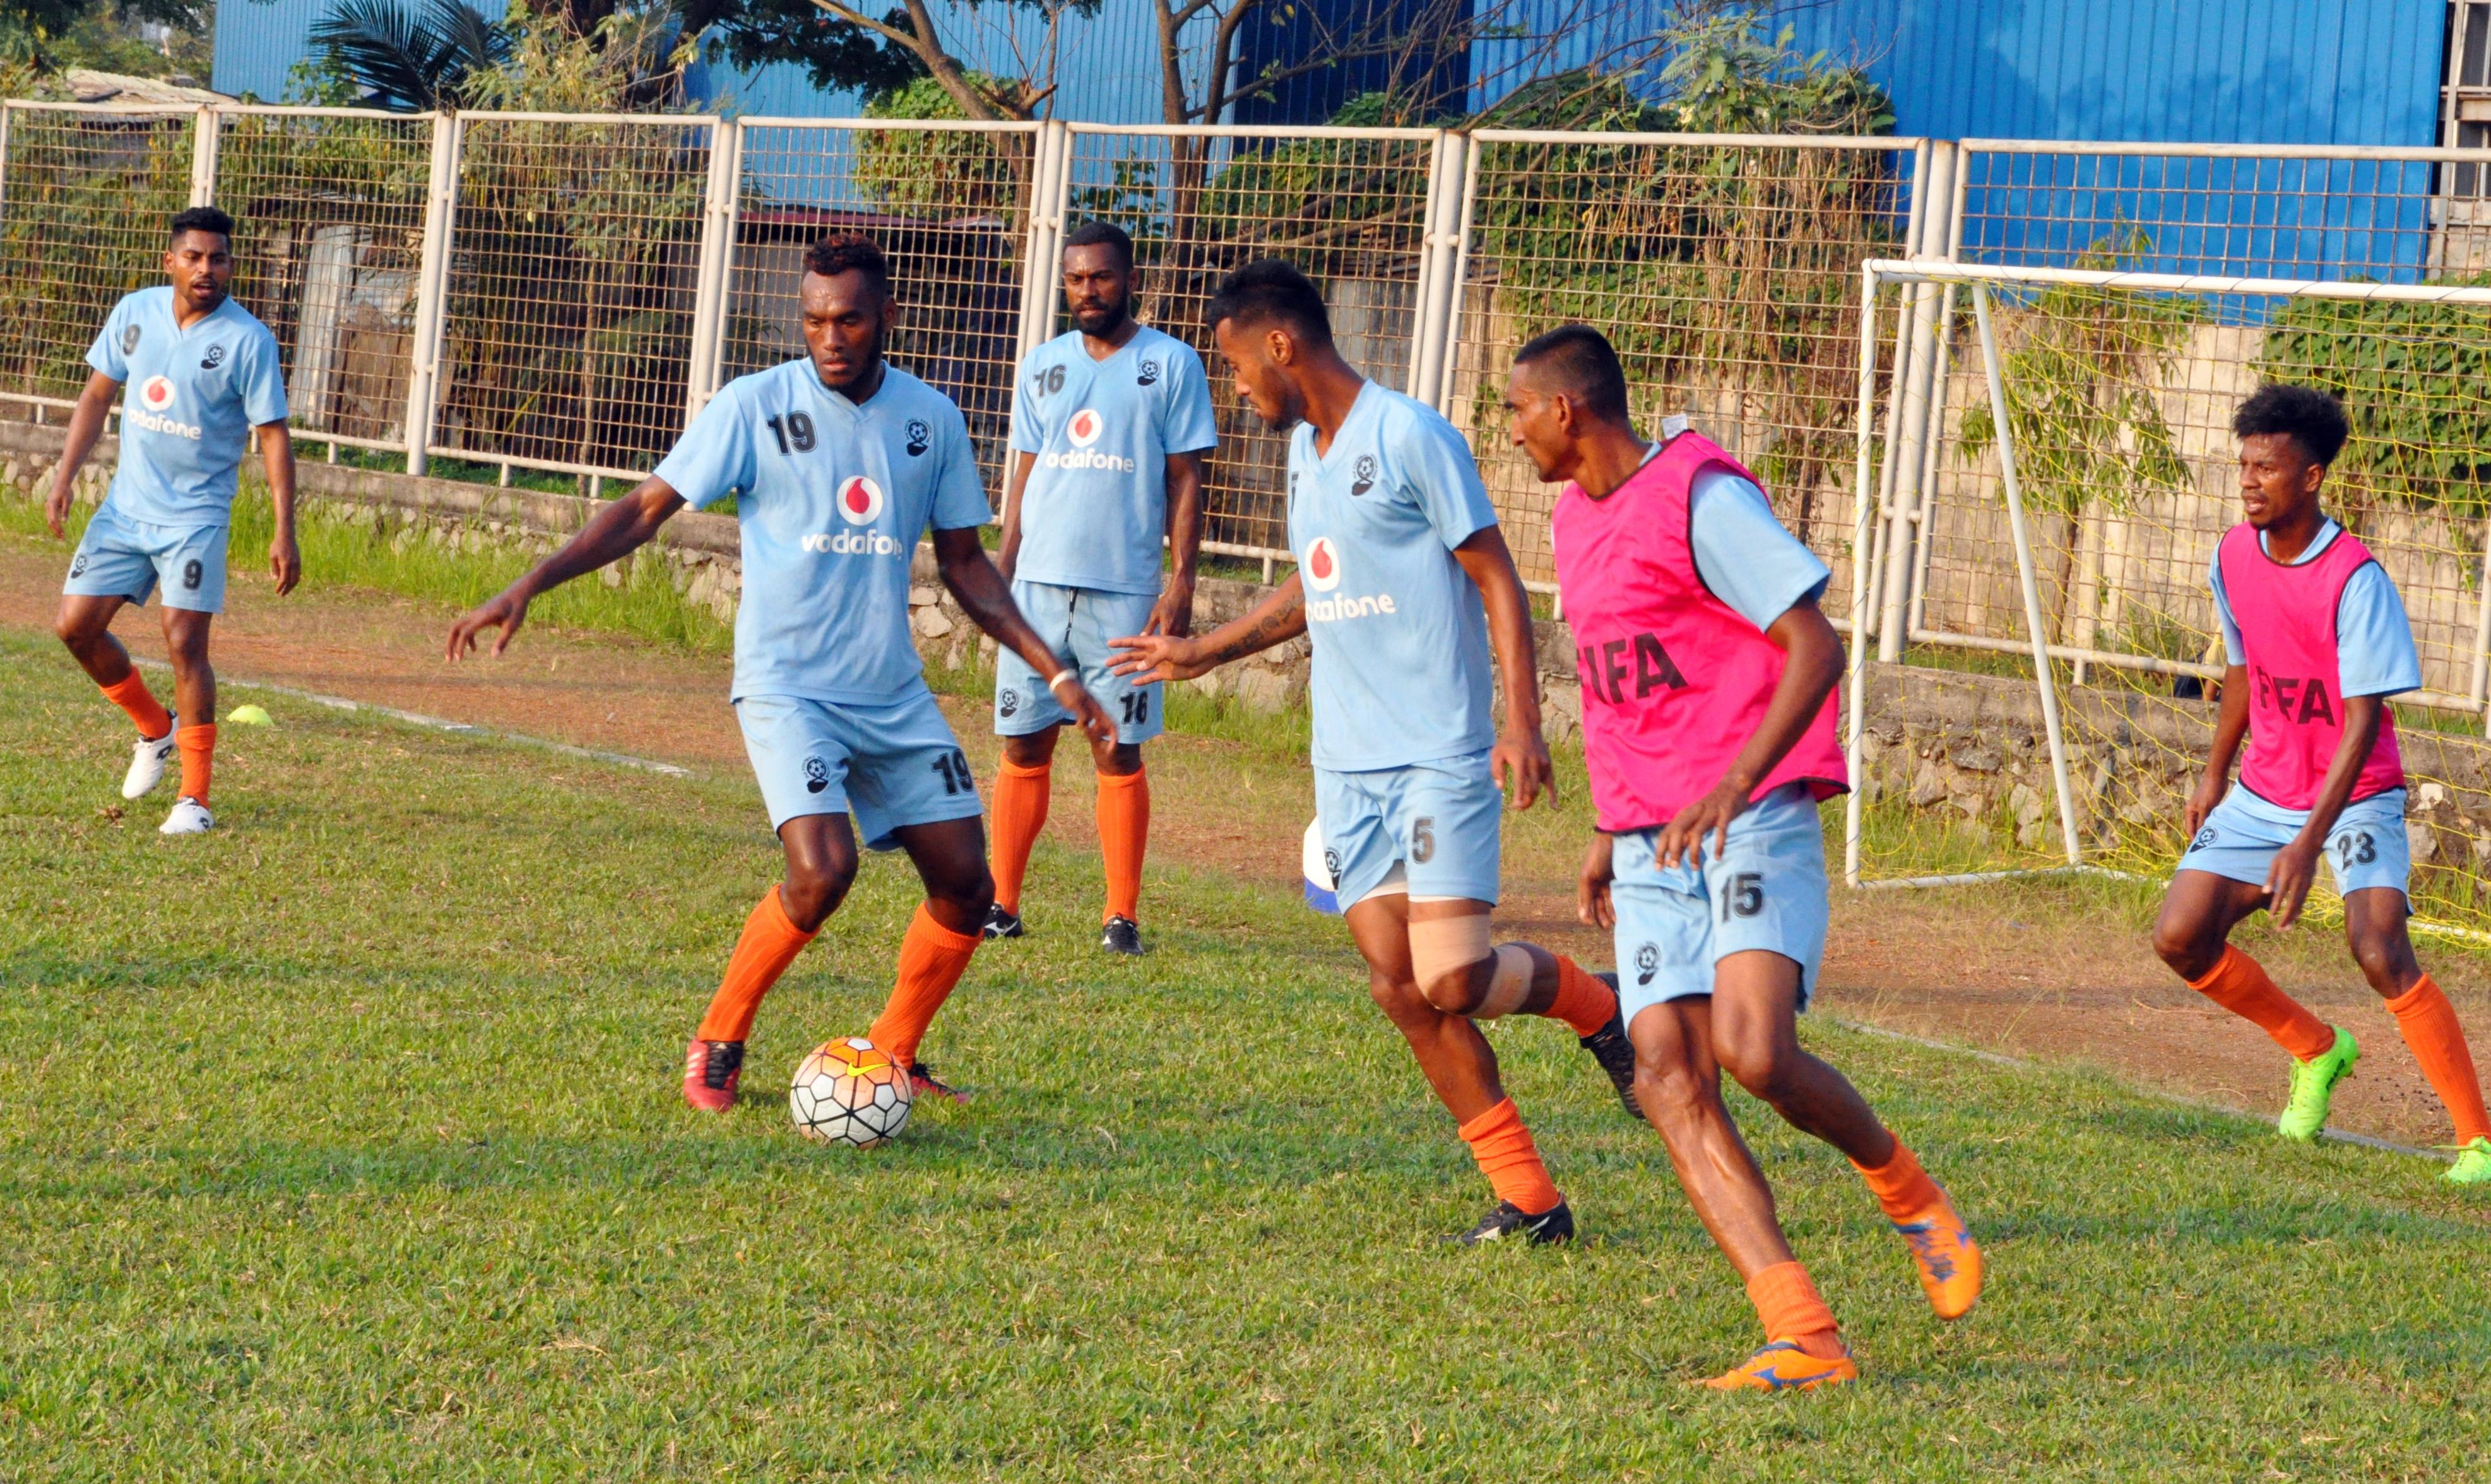 The Vodafone Fijian football team trainning in Indonesia on August 31, 2017. Photo: Vodafone Media